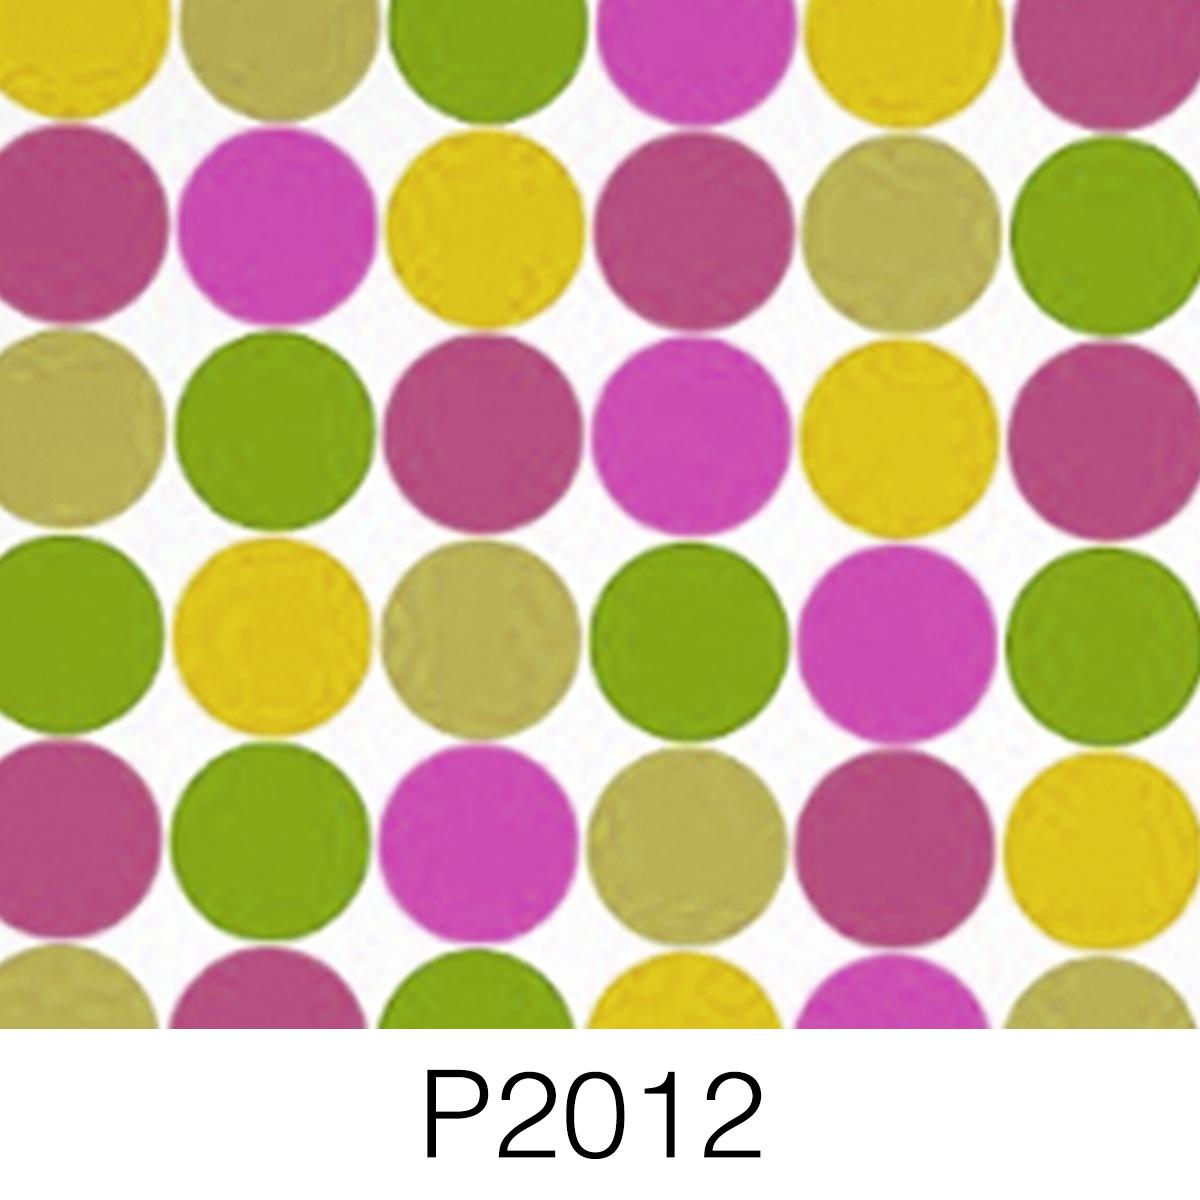 big_dots.jpg